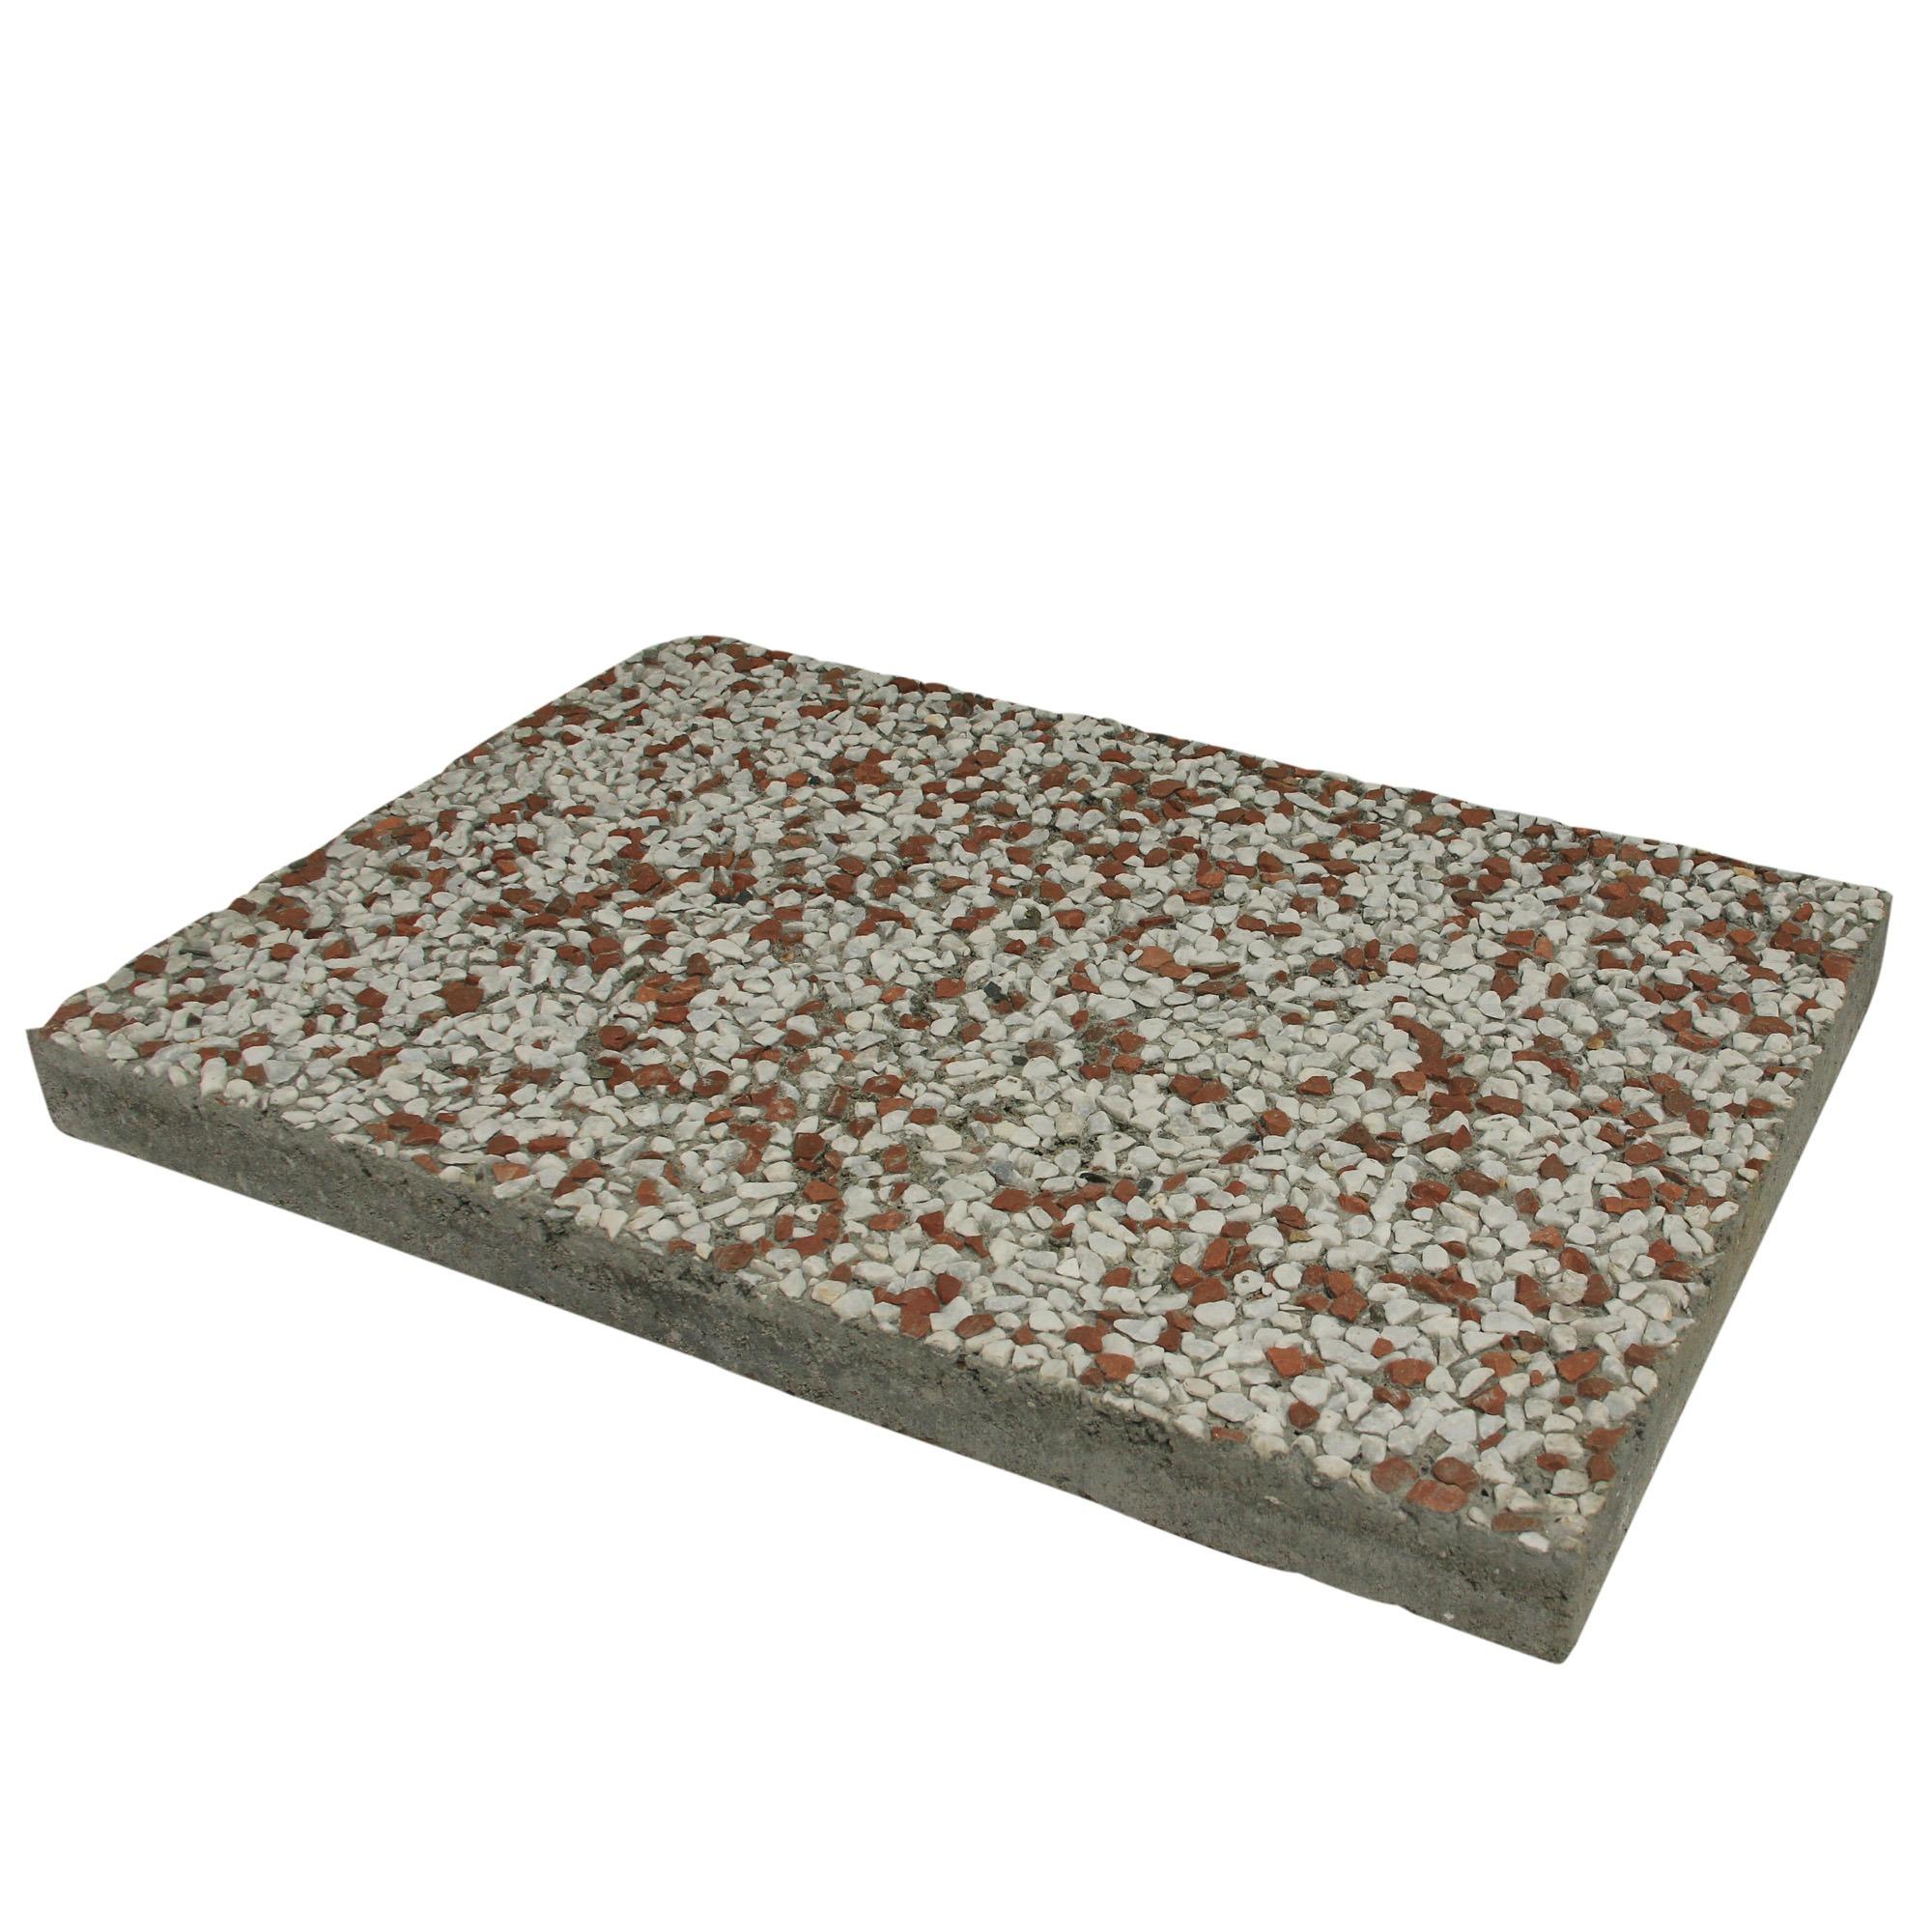 Grindtegel Wit/Rood 60x40 cm - Per Tegel - 0,24 m2